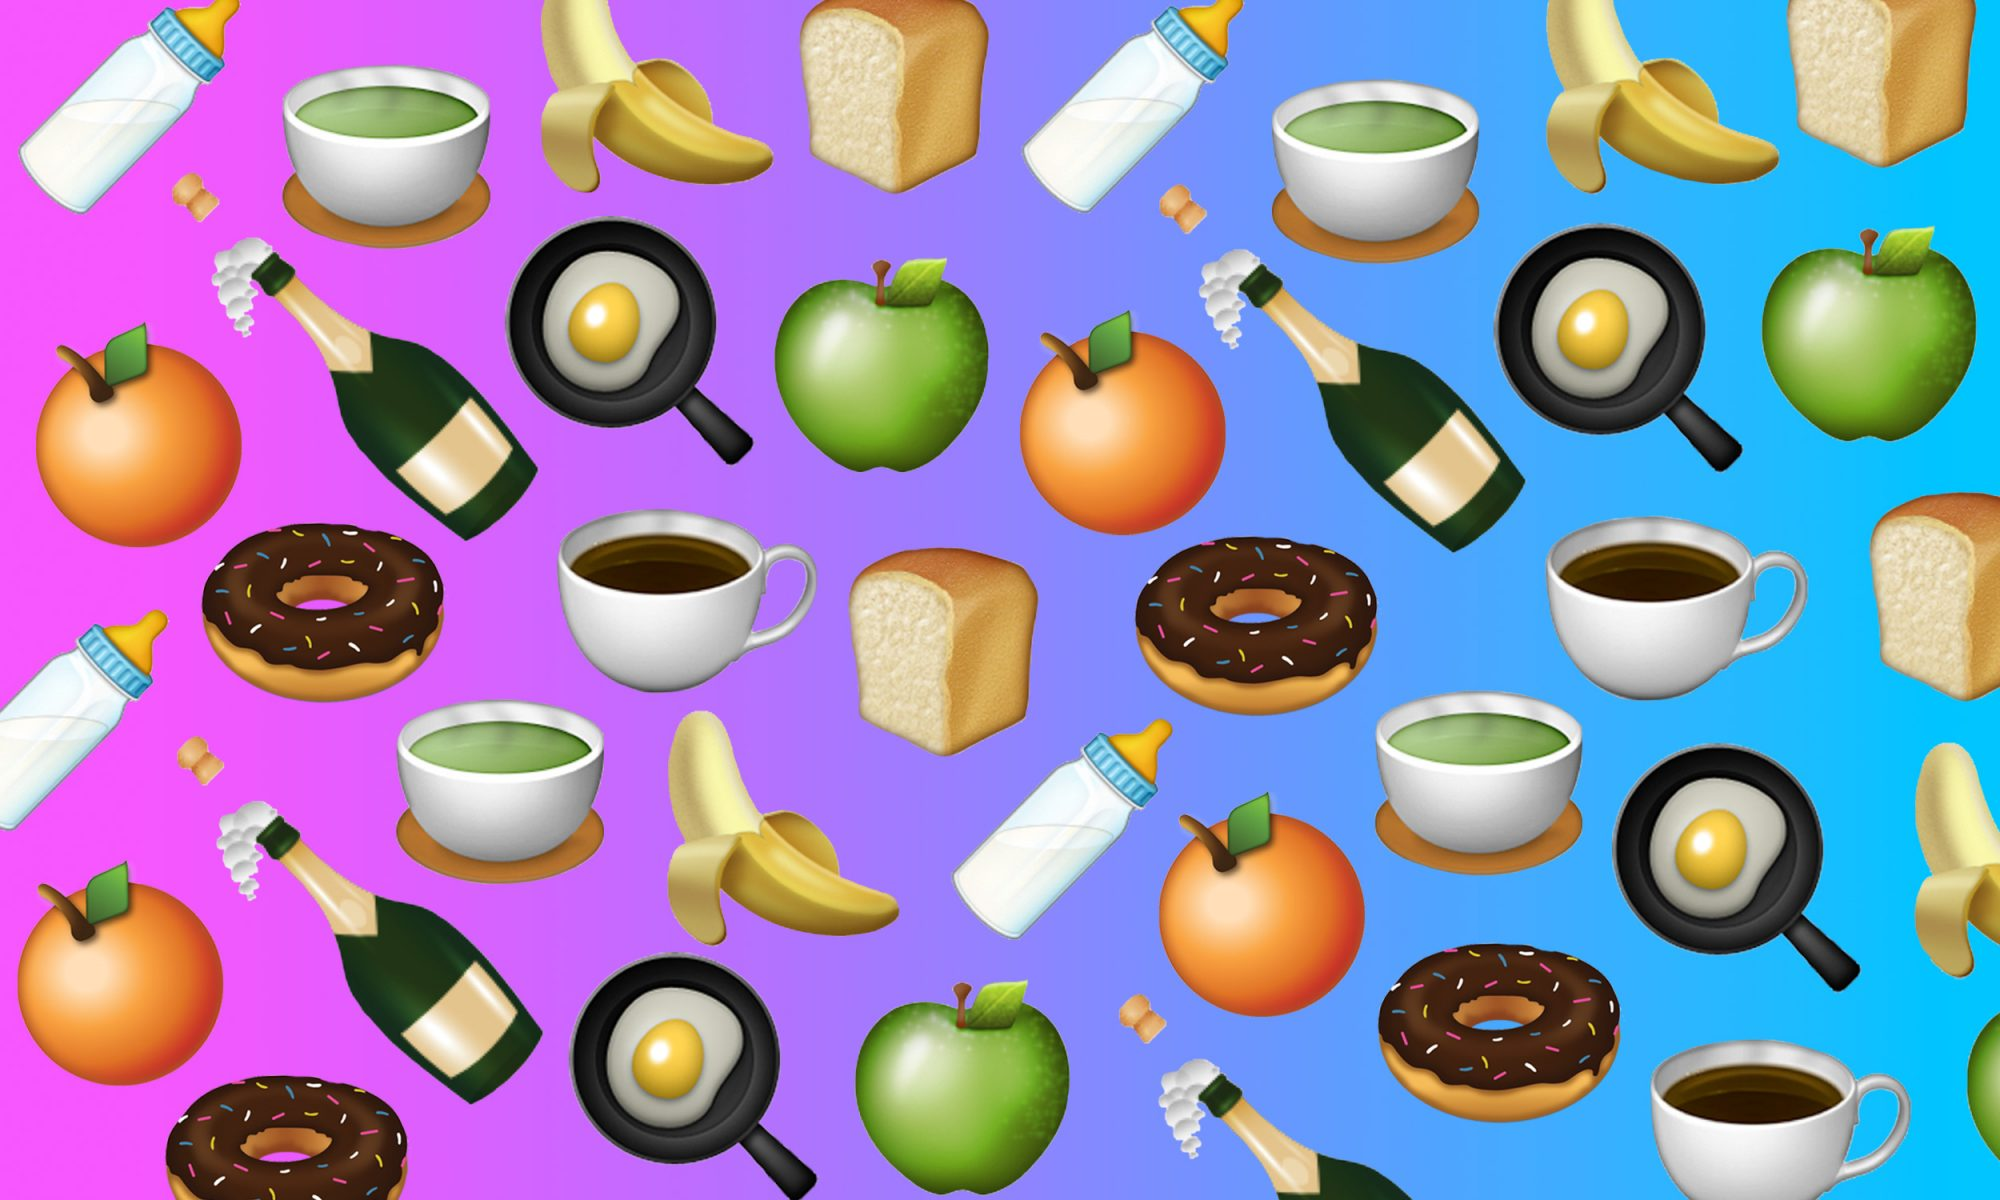 EC: Apple's iOS 10 Really Wants You to Use Breakfast Emoji